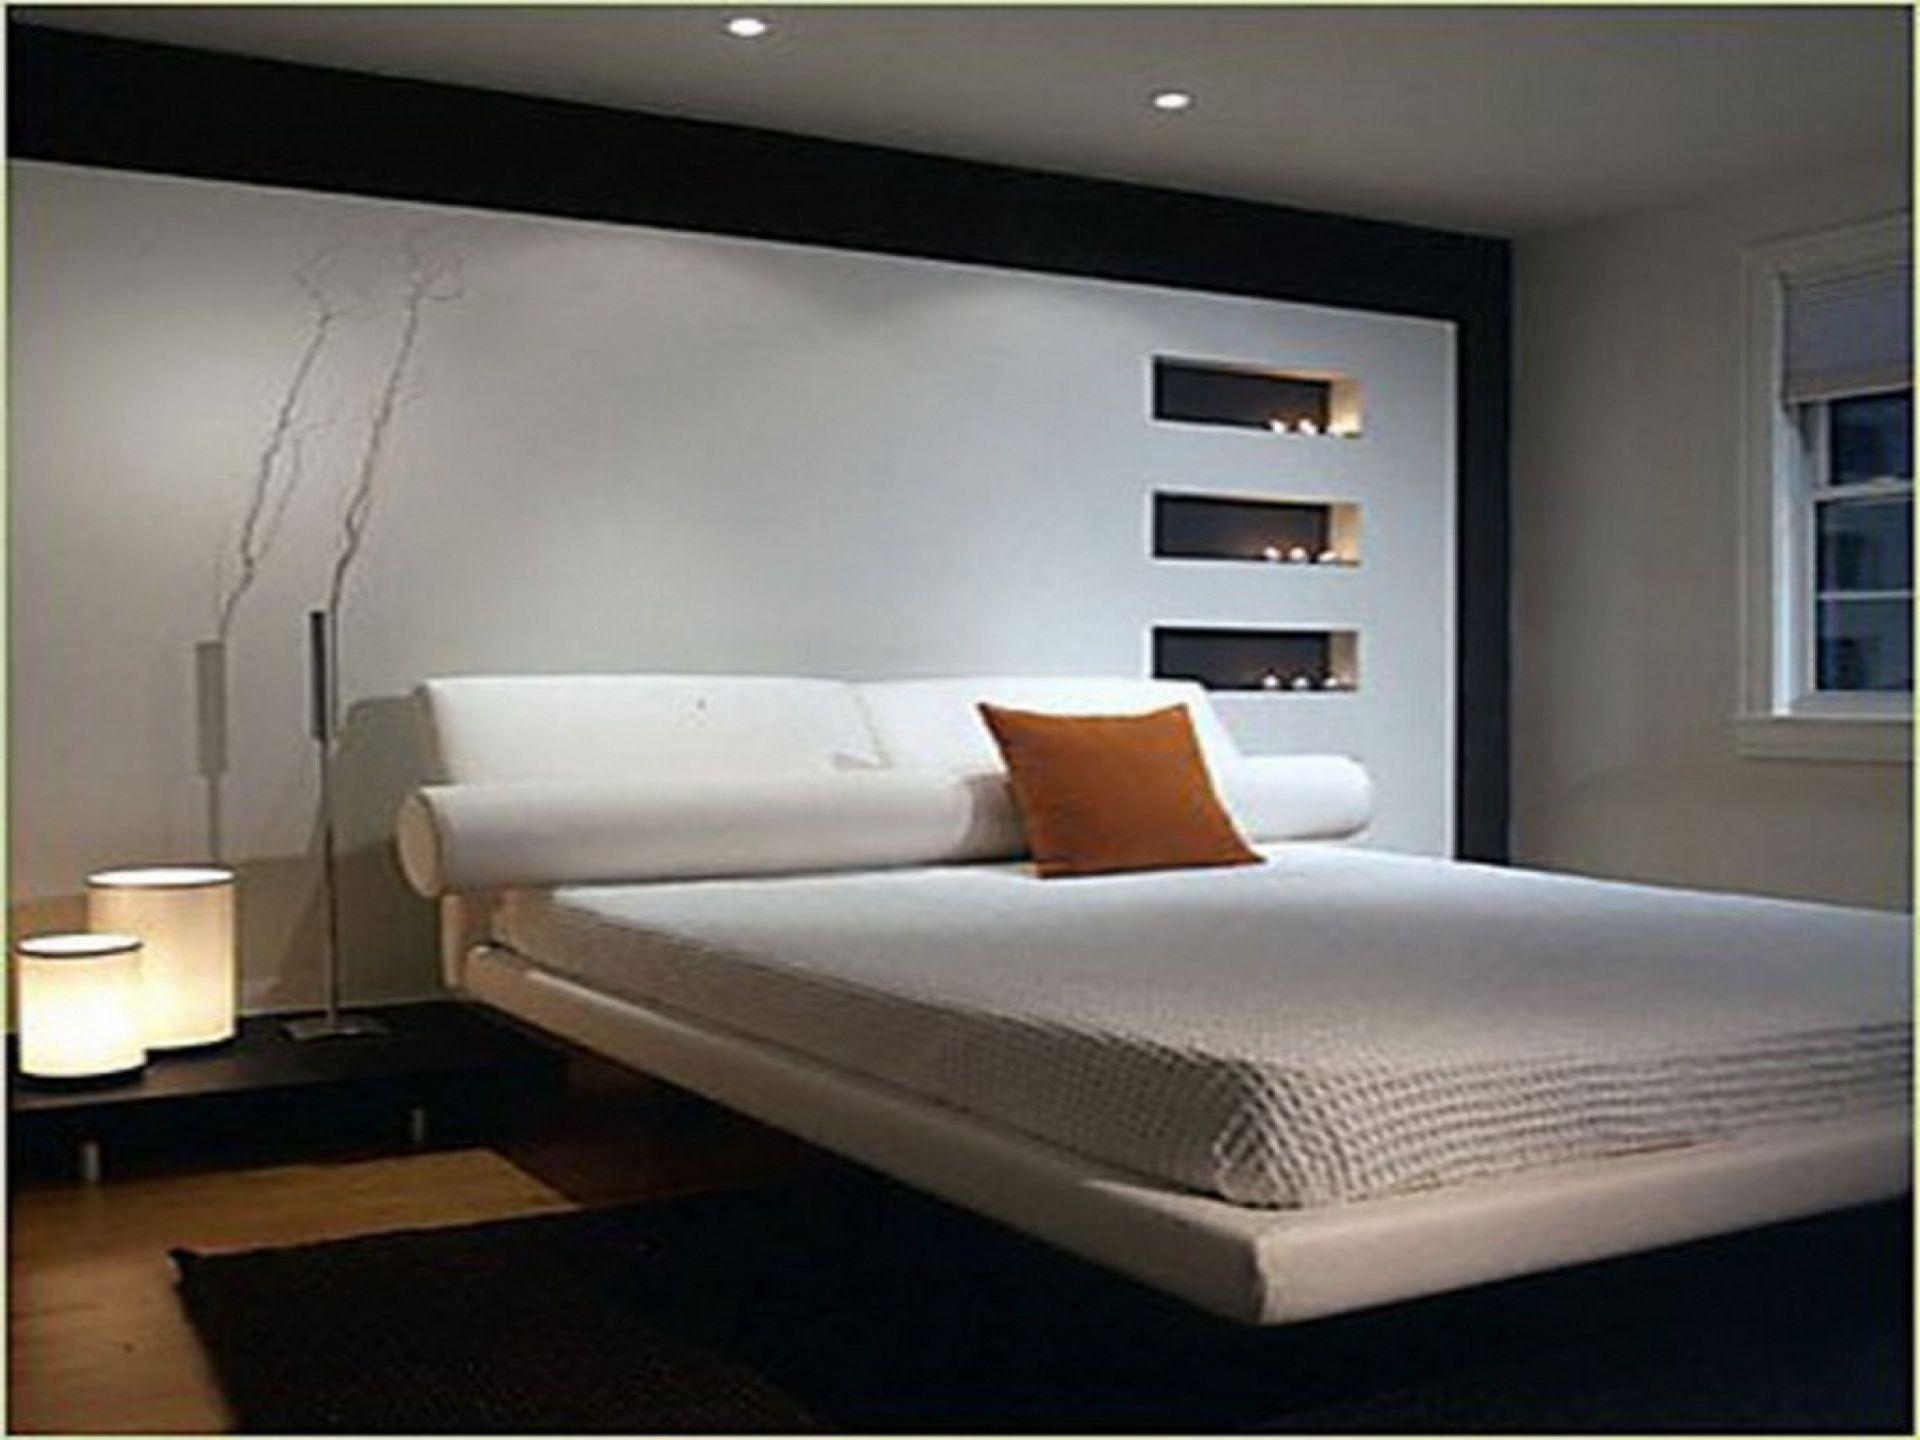 Charmant 11 Minimalist Bedroom Design Will Improve Your Sleep Quality